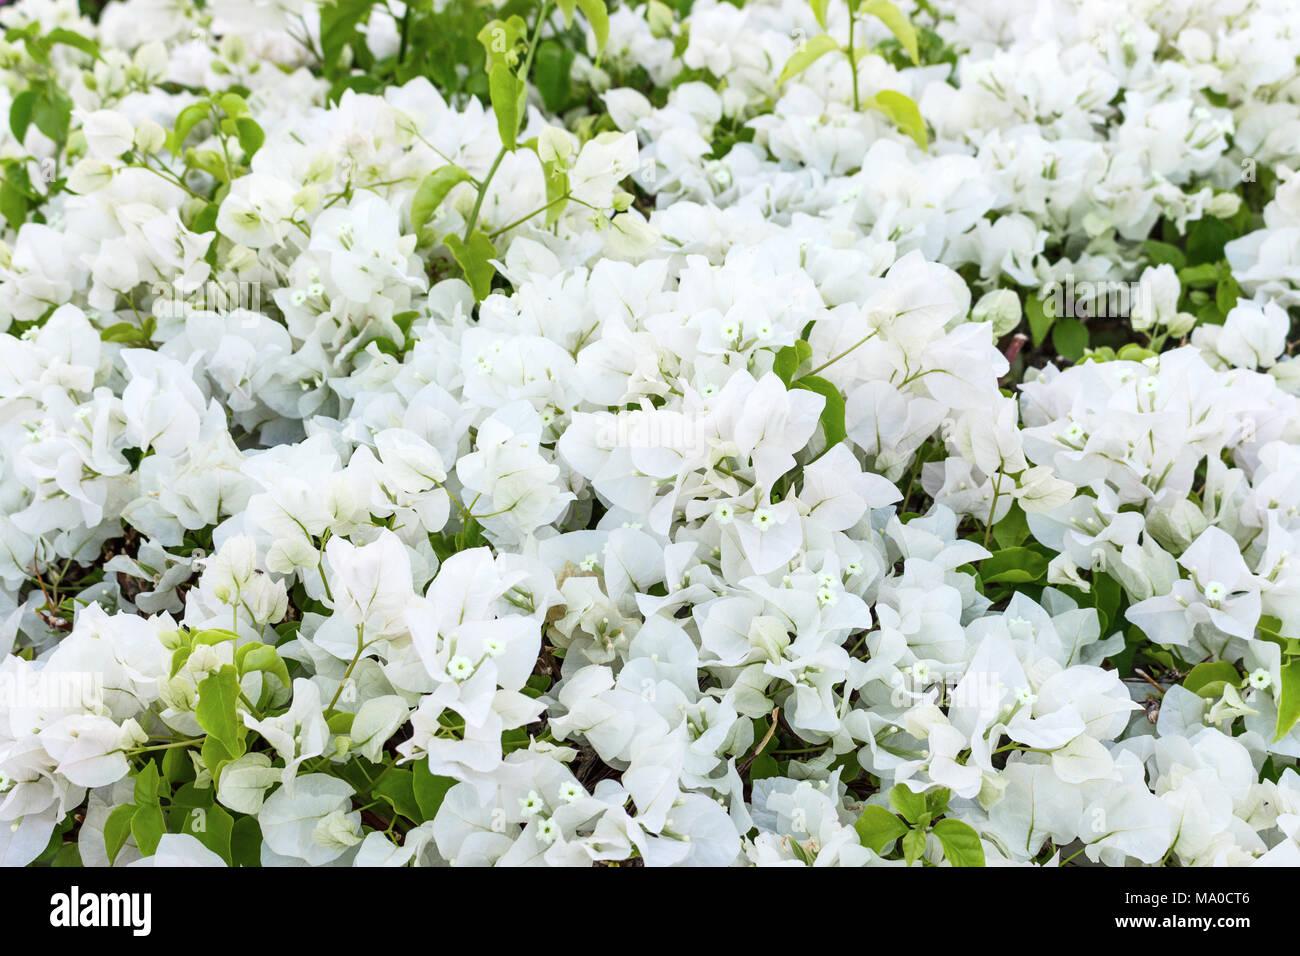 White small flower background gypsophila paniculata or baby breath white small flower background gypsophila paniculata or baby breath flowers mightylinksfo